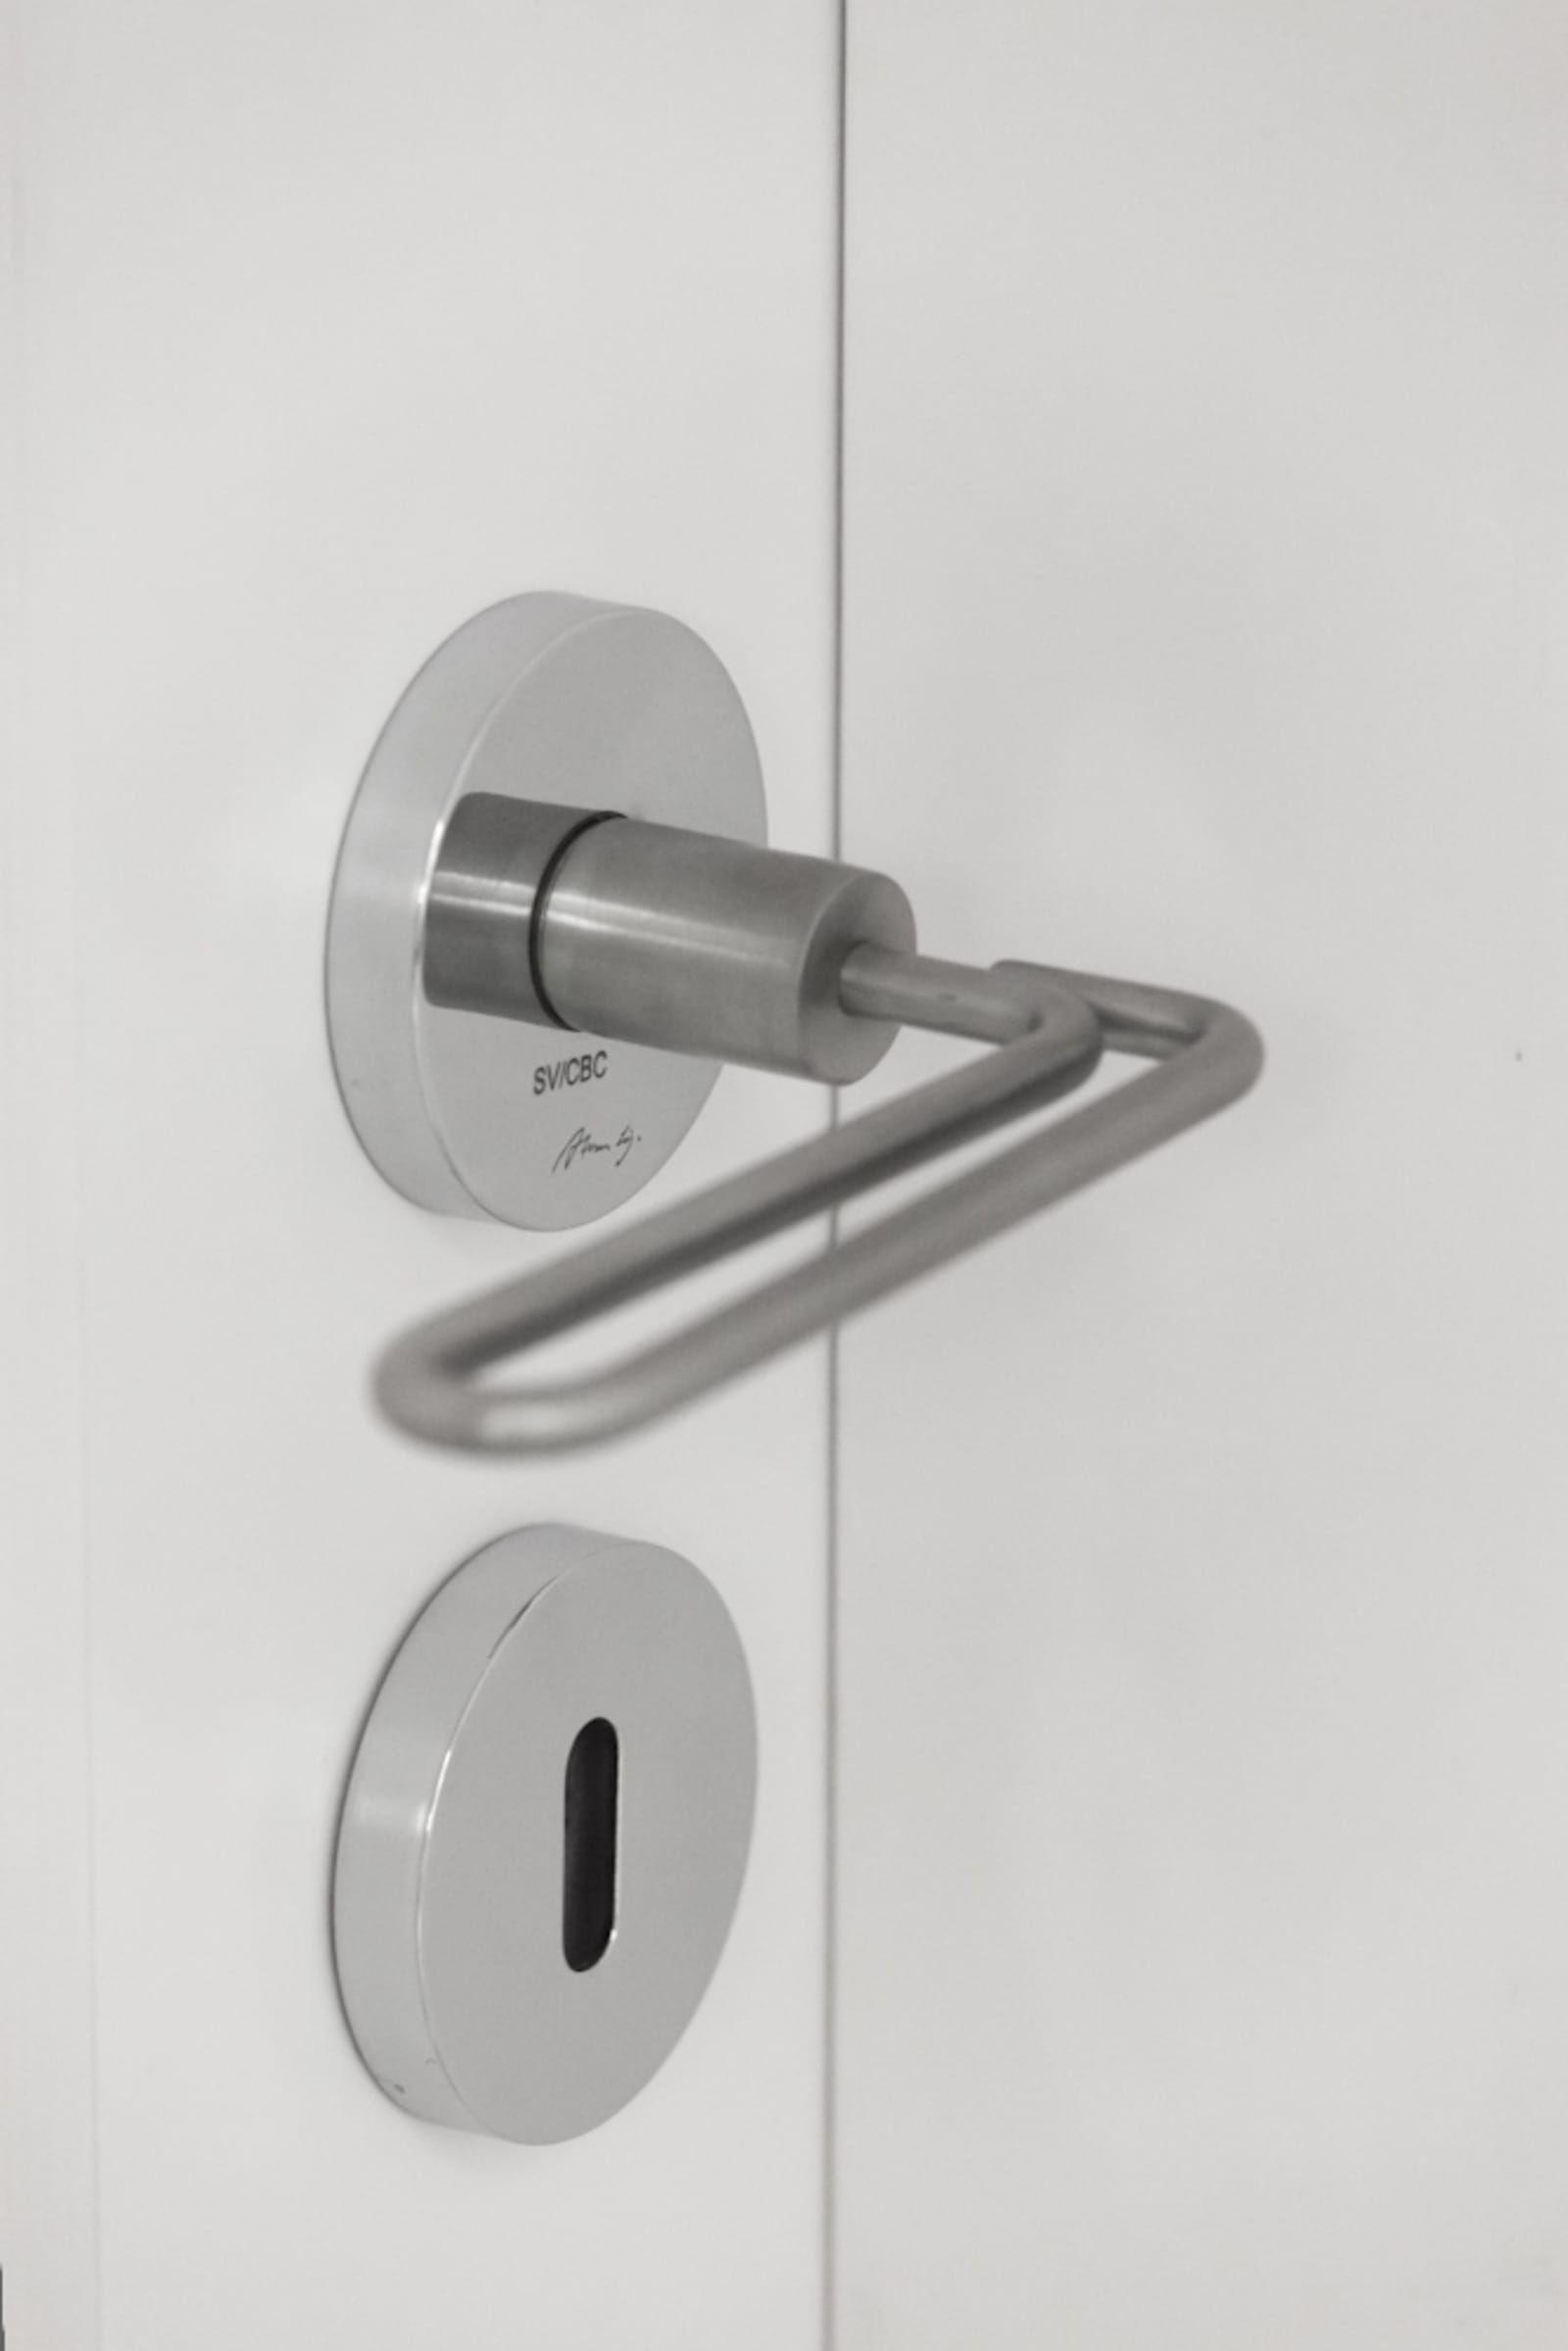 Alvaro Siza Vieira Door Handle Design Industrial Inspiration Objects Design